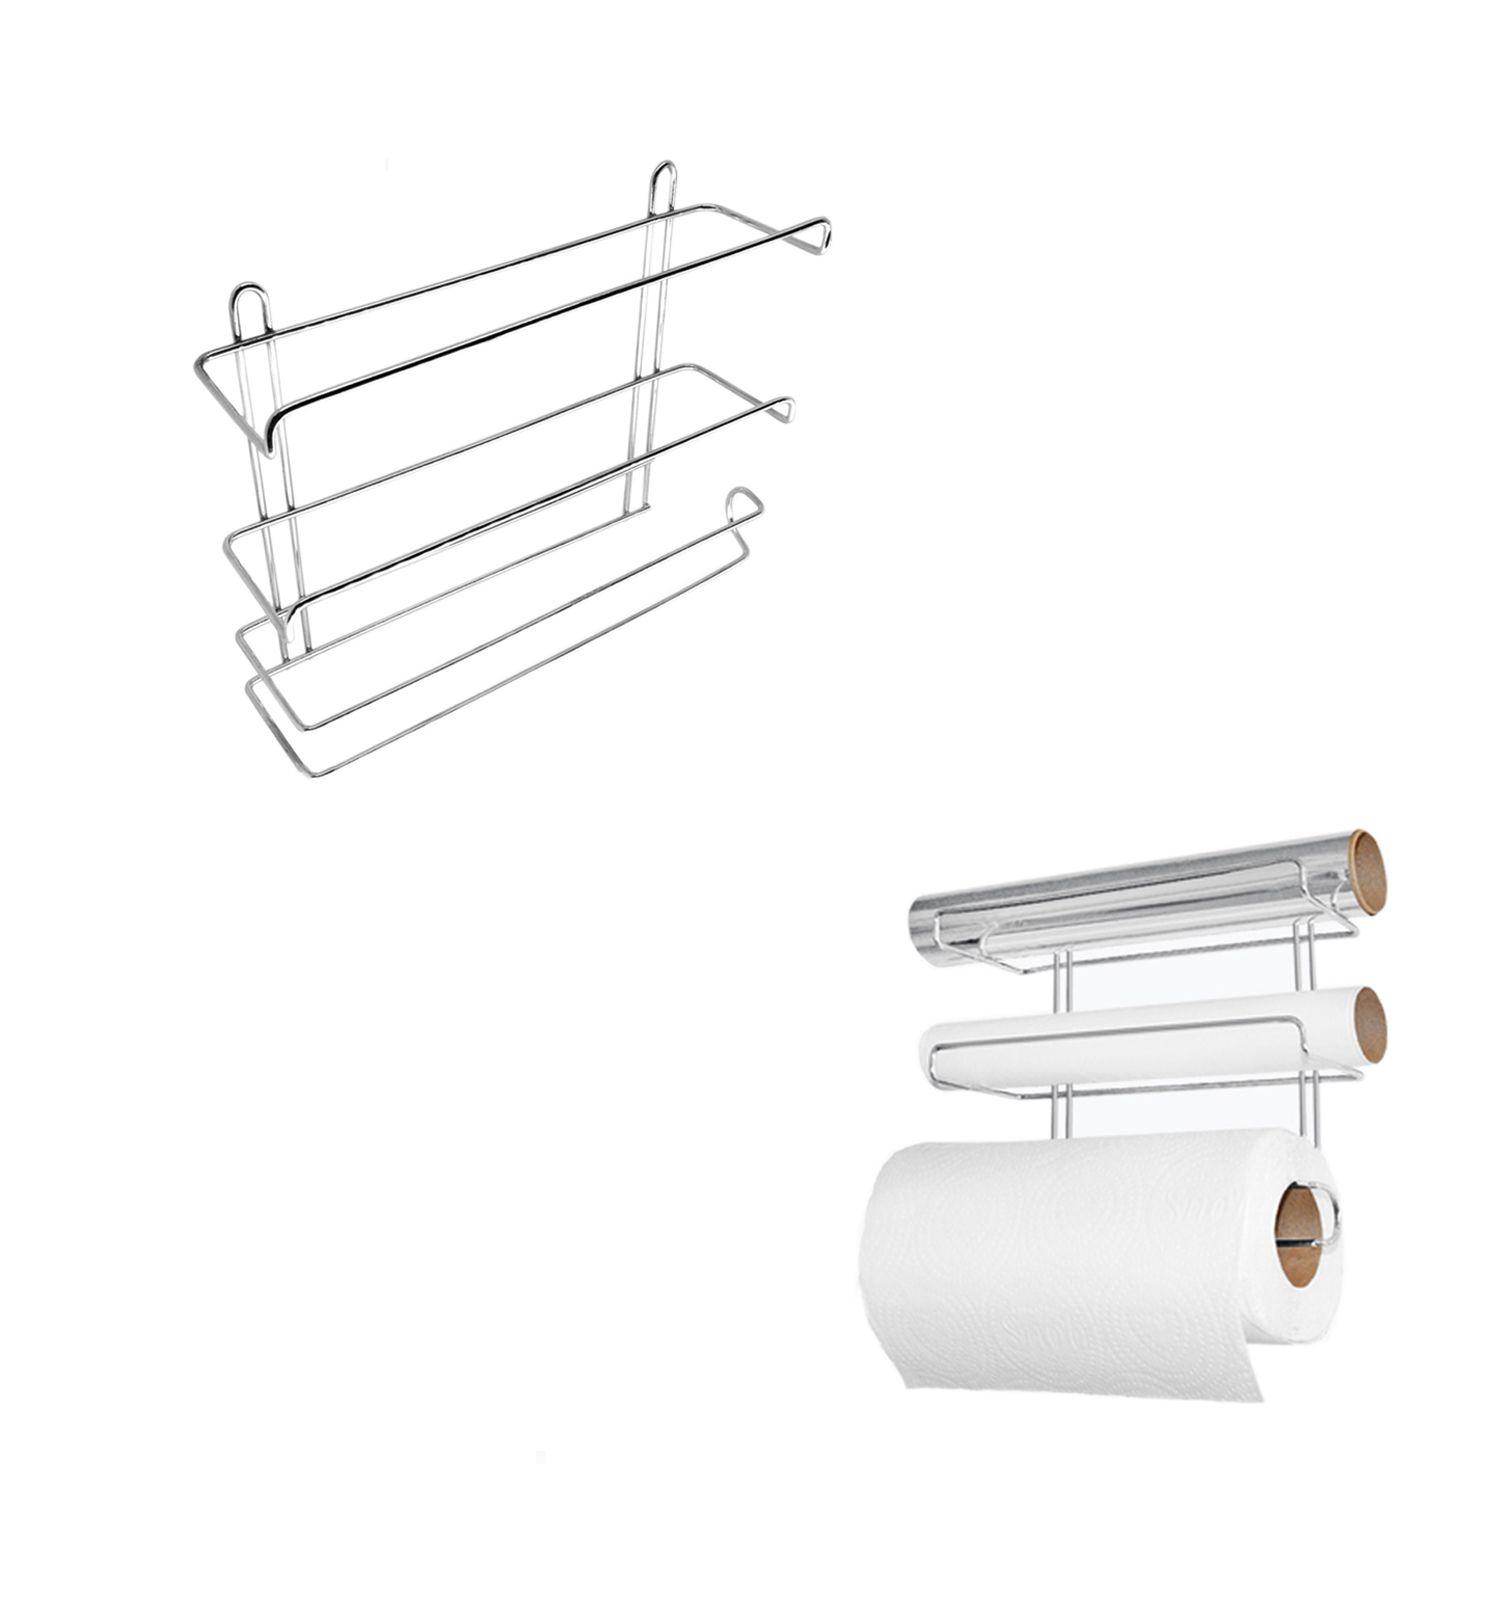 Suporte Triplo para Rolos Papel/Alumínio/Filme